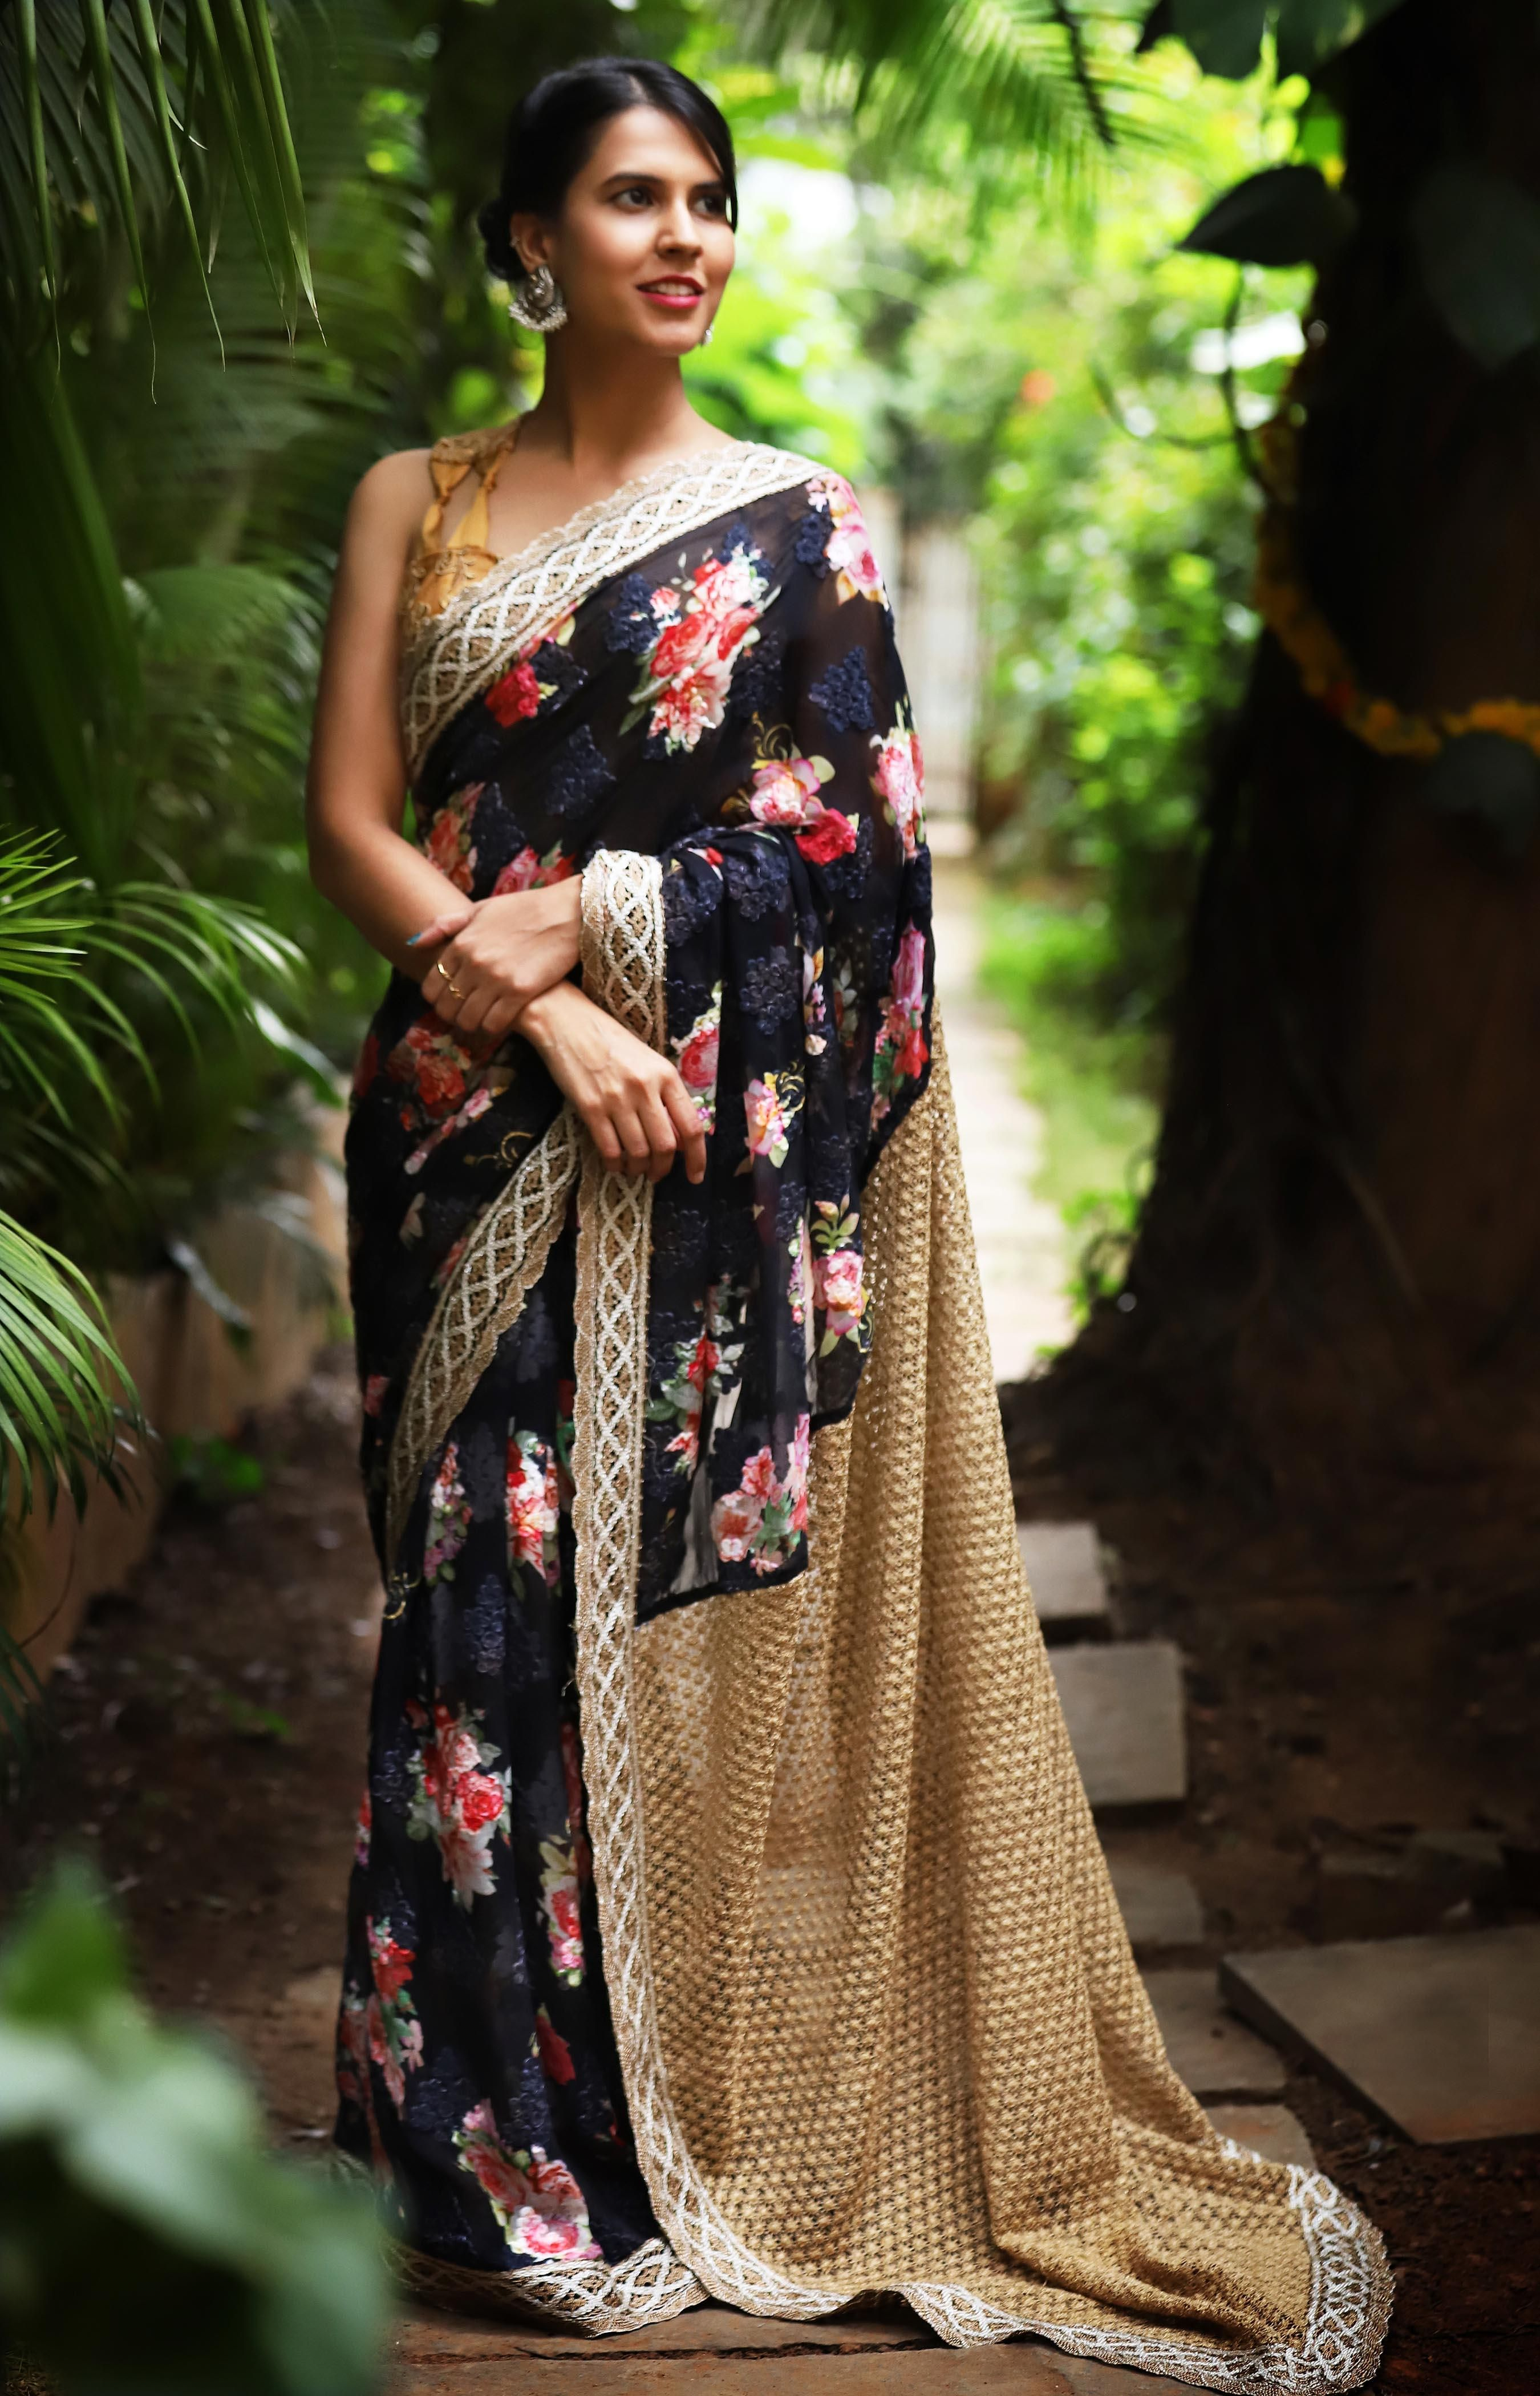 Karachi Chiffon With Rose Print And Emroidery With Gold Chrochet Pallu Saree Blouse Houseofblouse Designer Blouses Online Floral Print Sarees Saree Styles